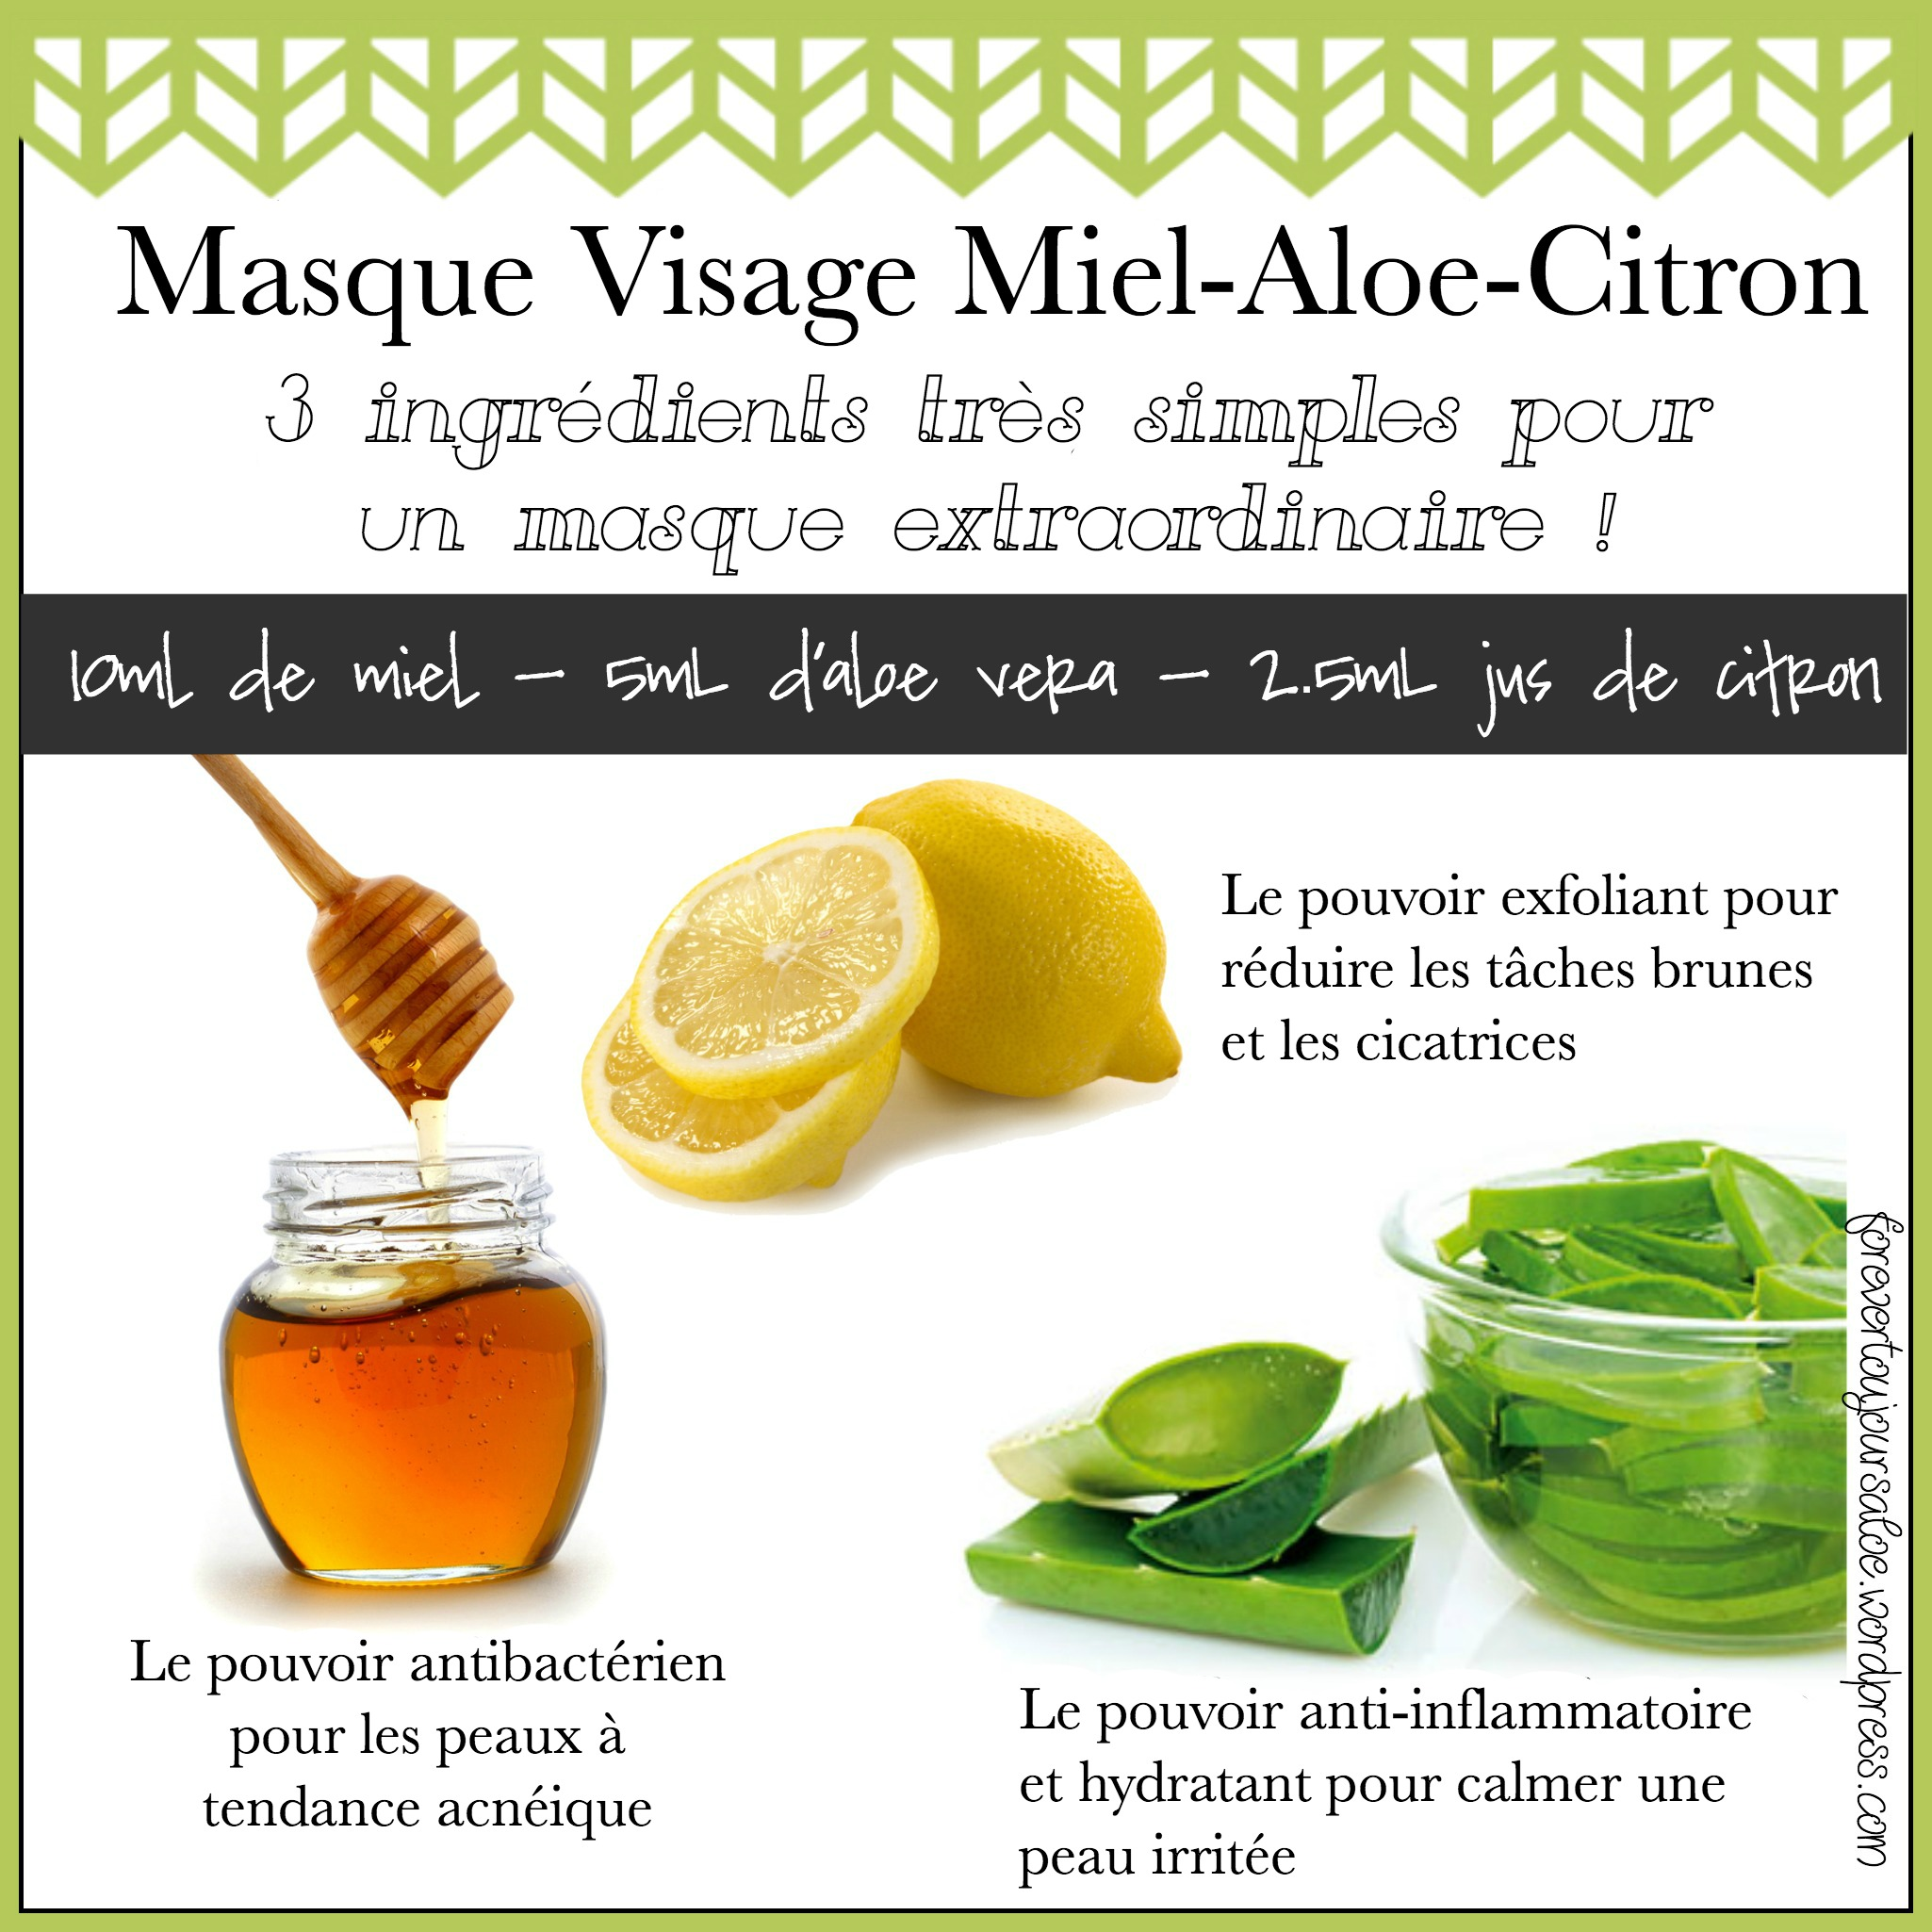 masque visage miel aloe citron forever toujours aloe. Black Bedroom Furniture Sets. Home Design Ideas